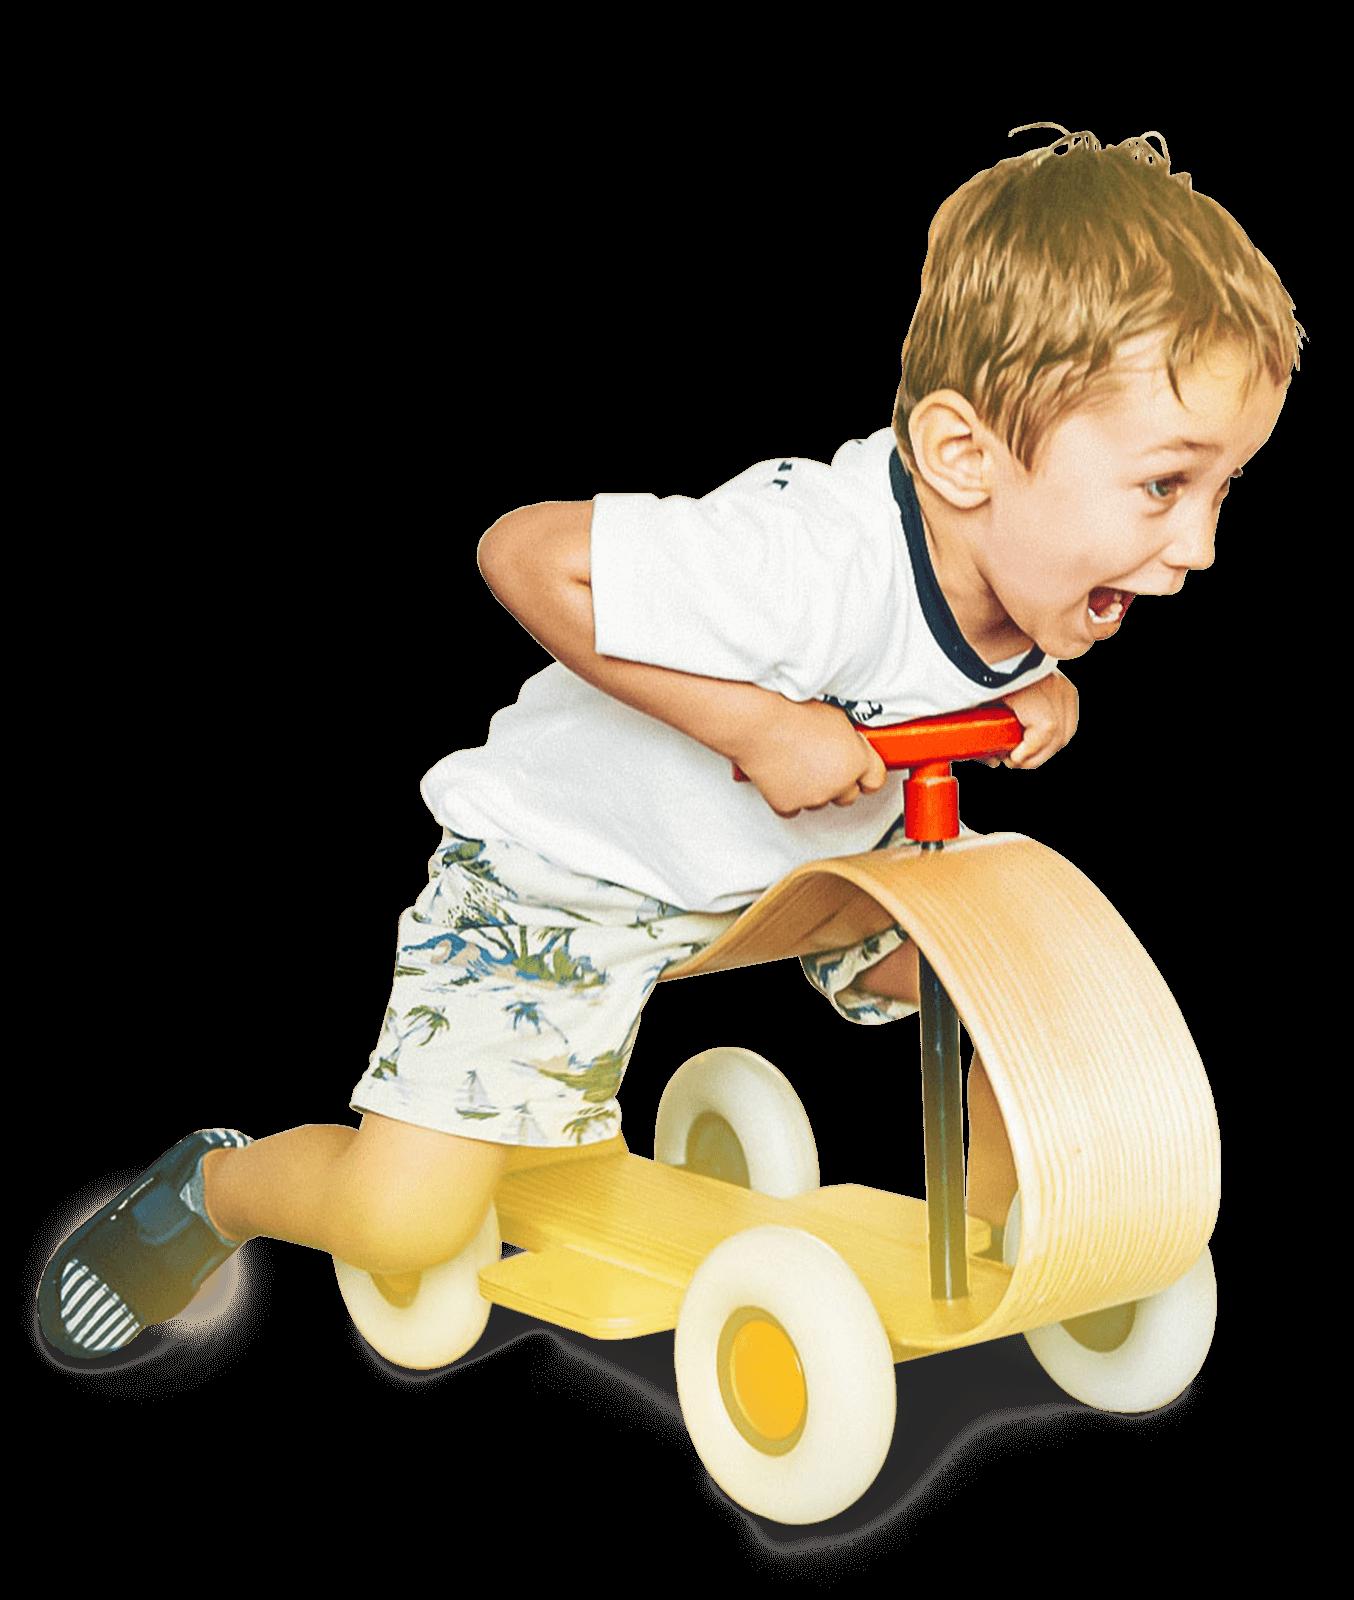 Kita Kind auf Holzroller